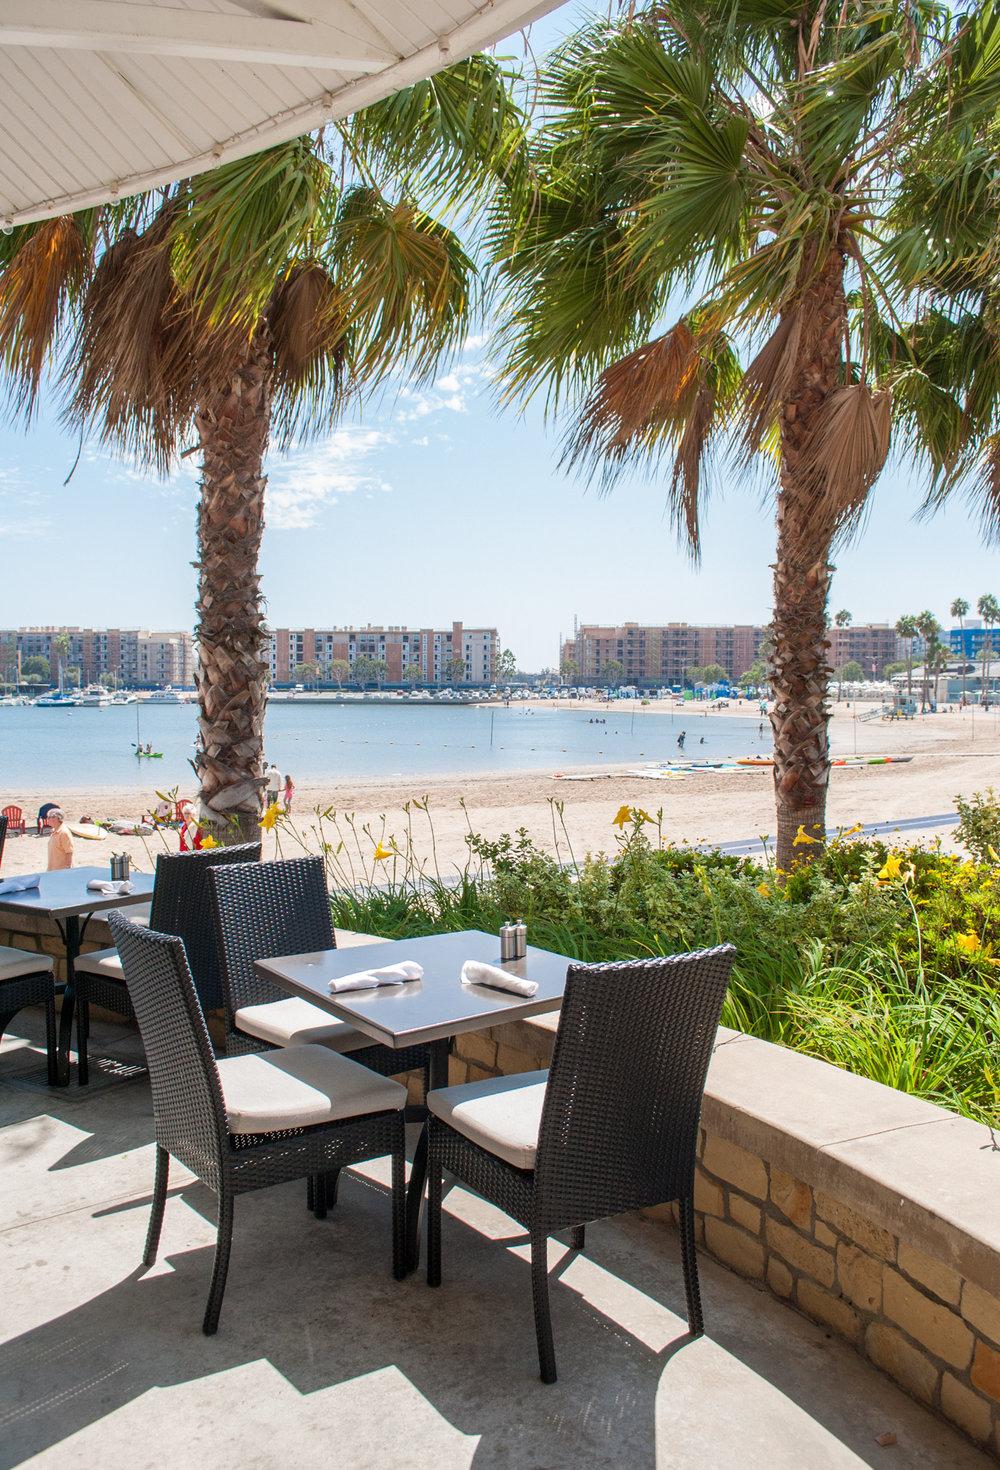 Beachside Restaurant & Bar, Marina del Rey, CA